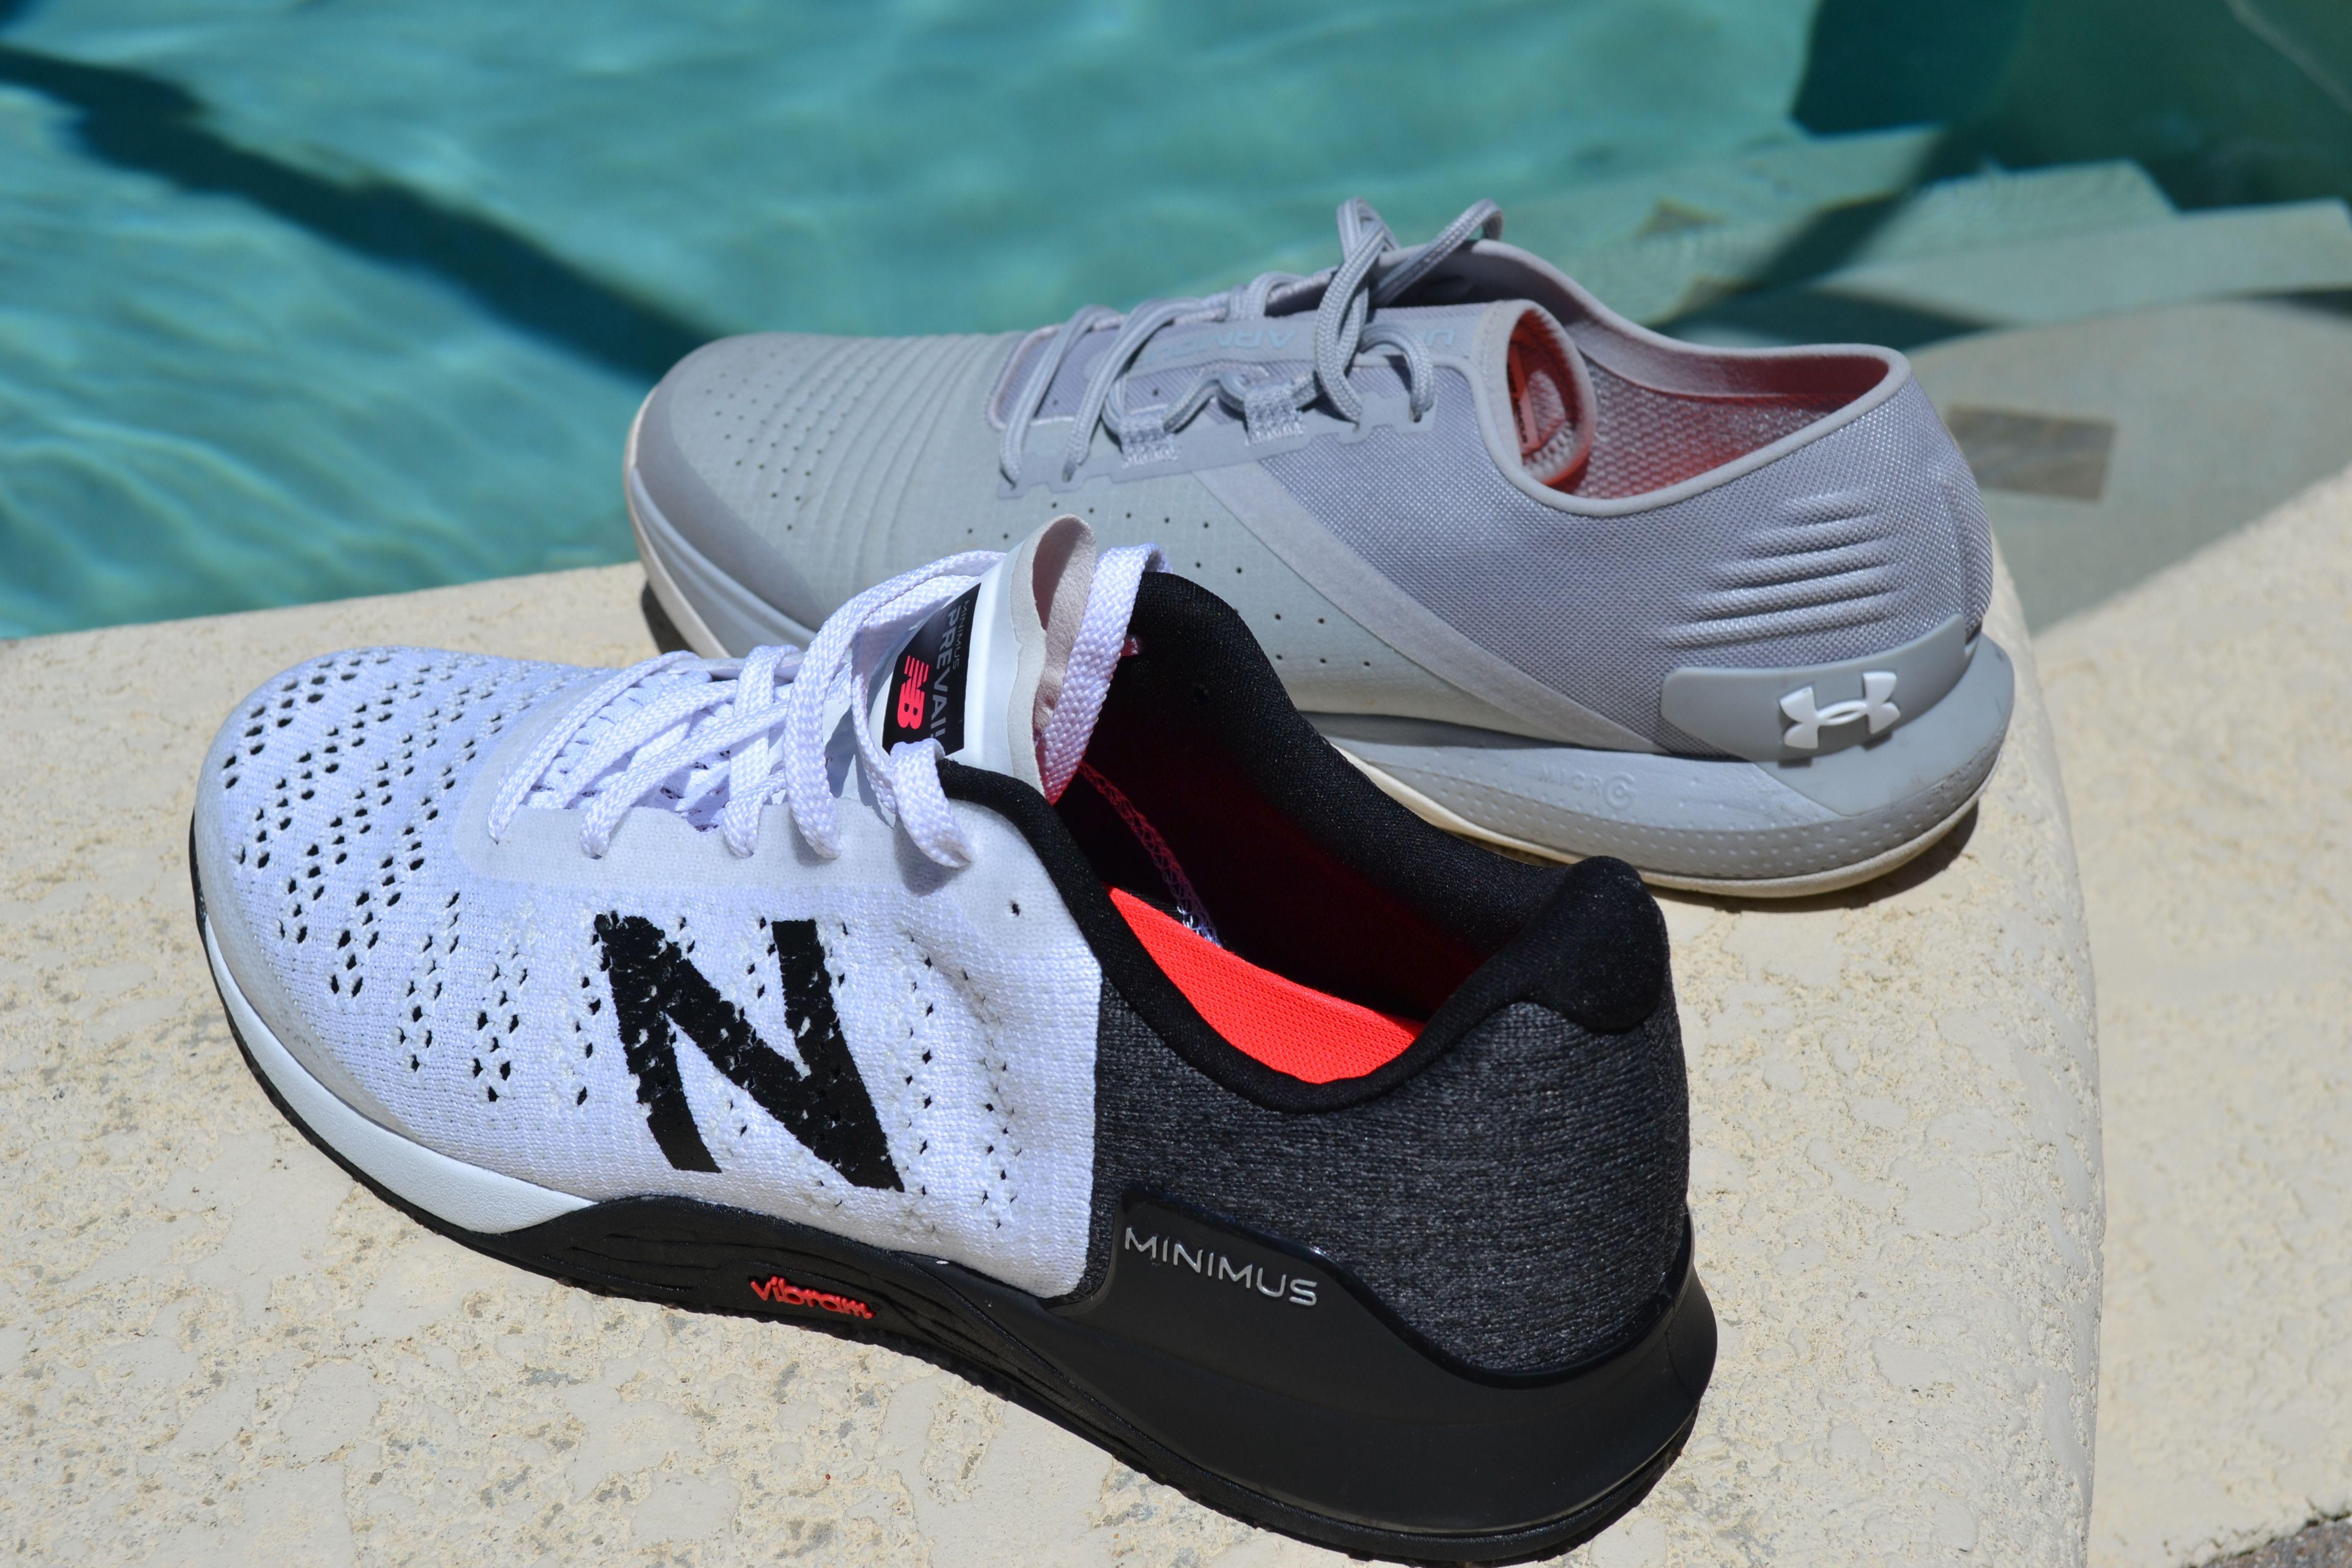 Crossfit shoes, New balance minimus